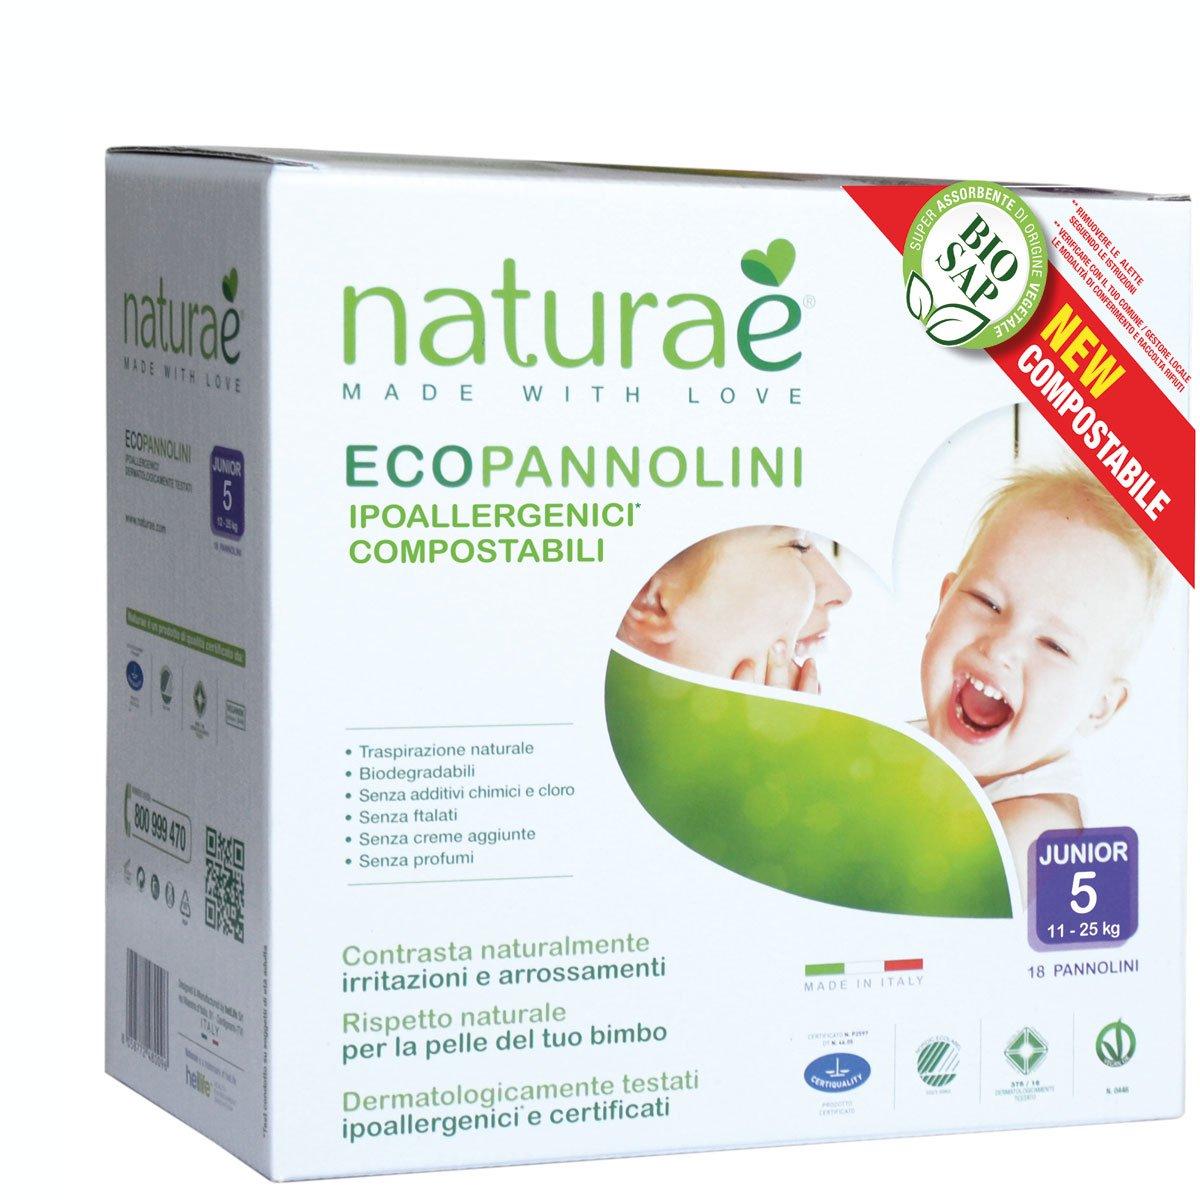 Ecopannolini Compostabili Naturaè® 5 JUNIOR 11-25 kg, 18 pz